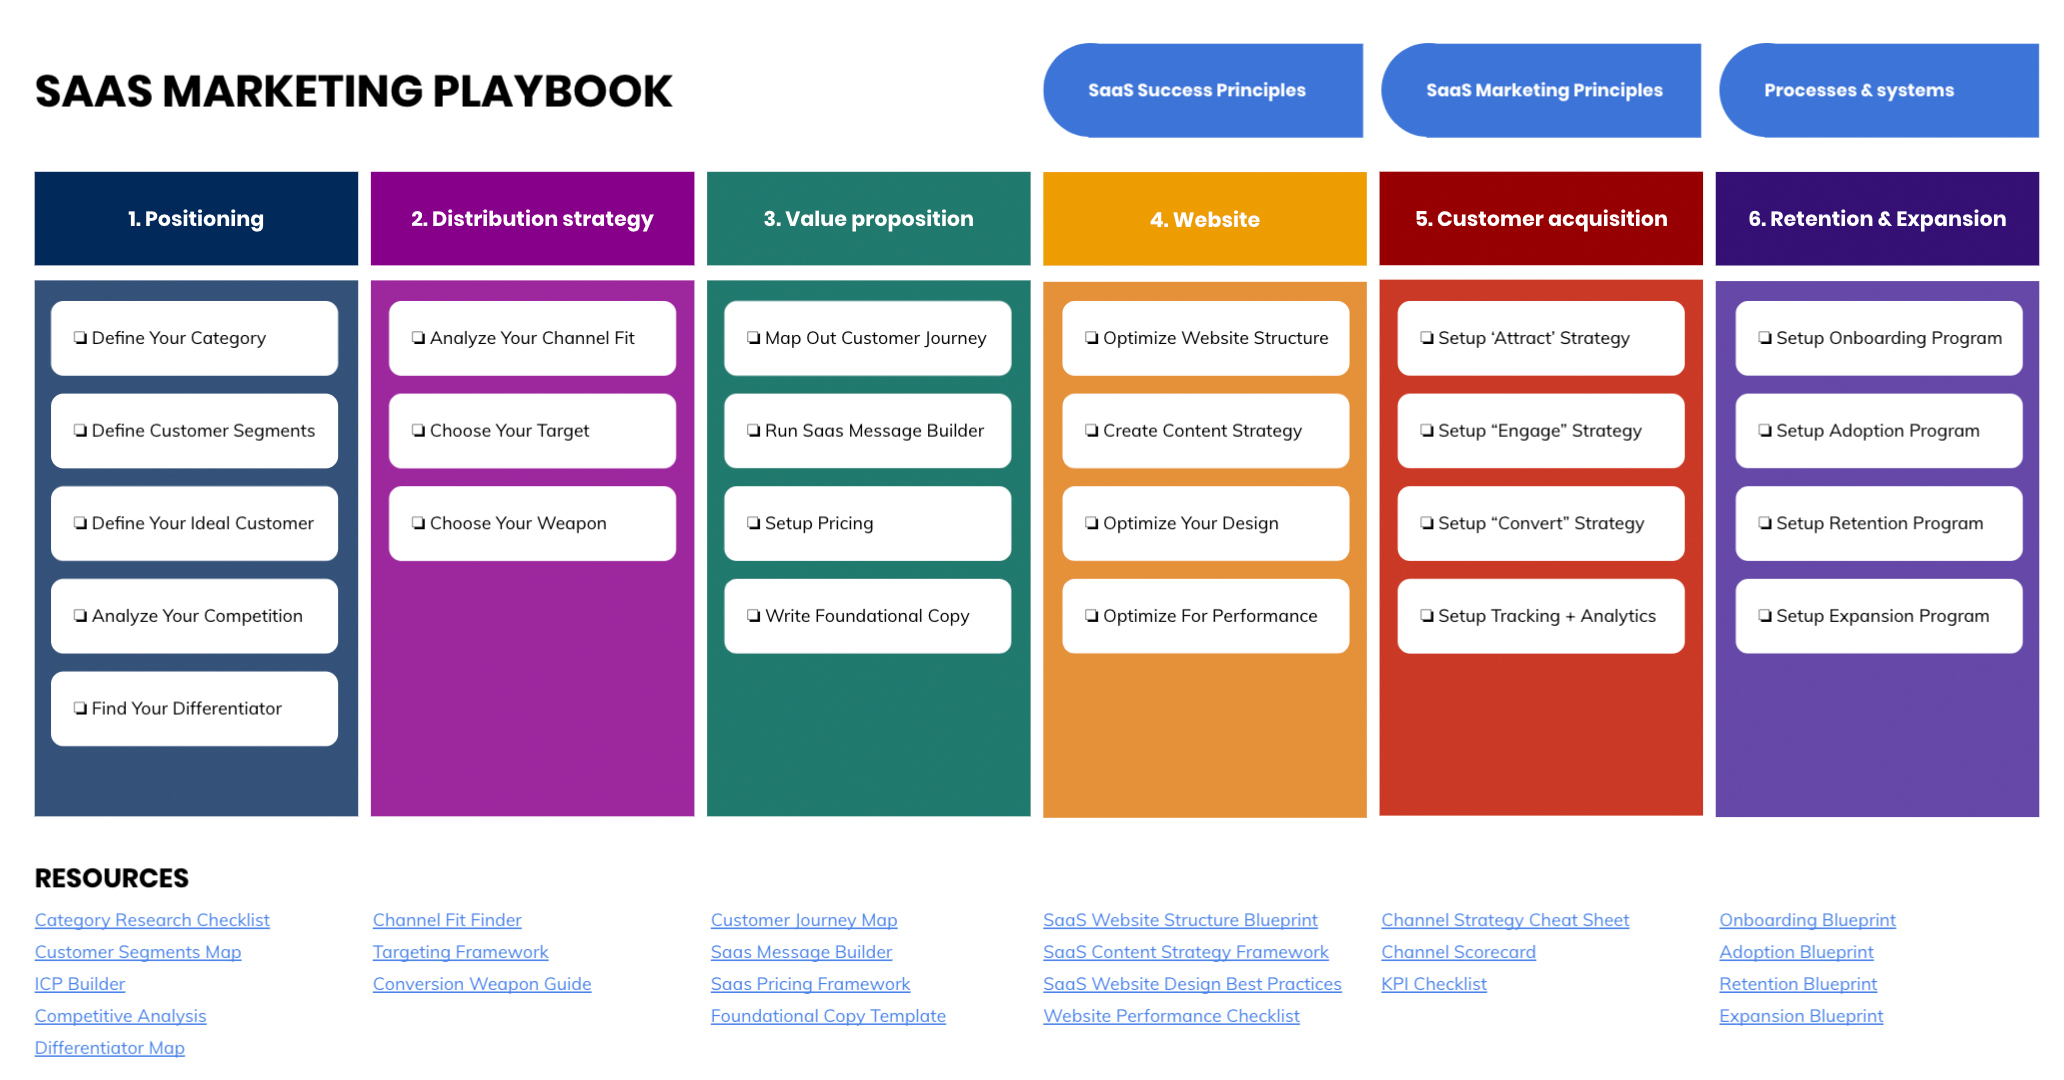 saas marketing playbook